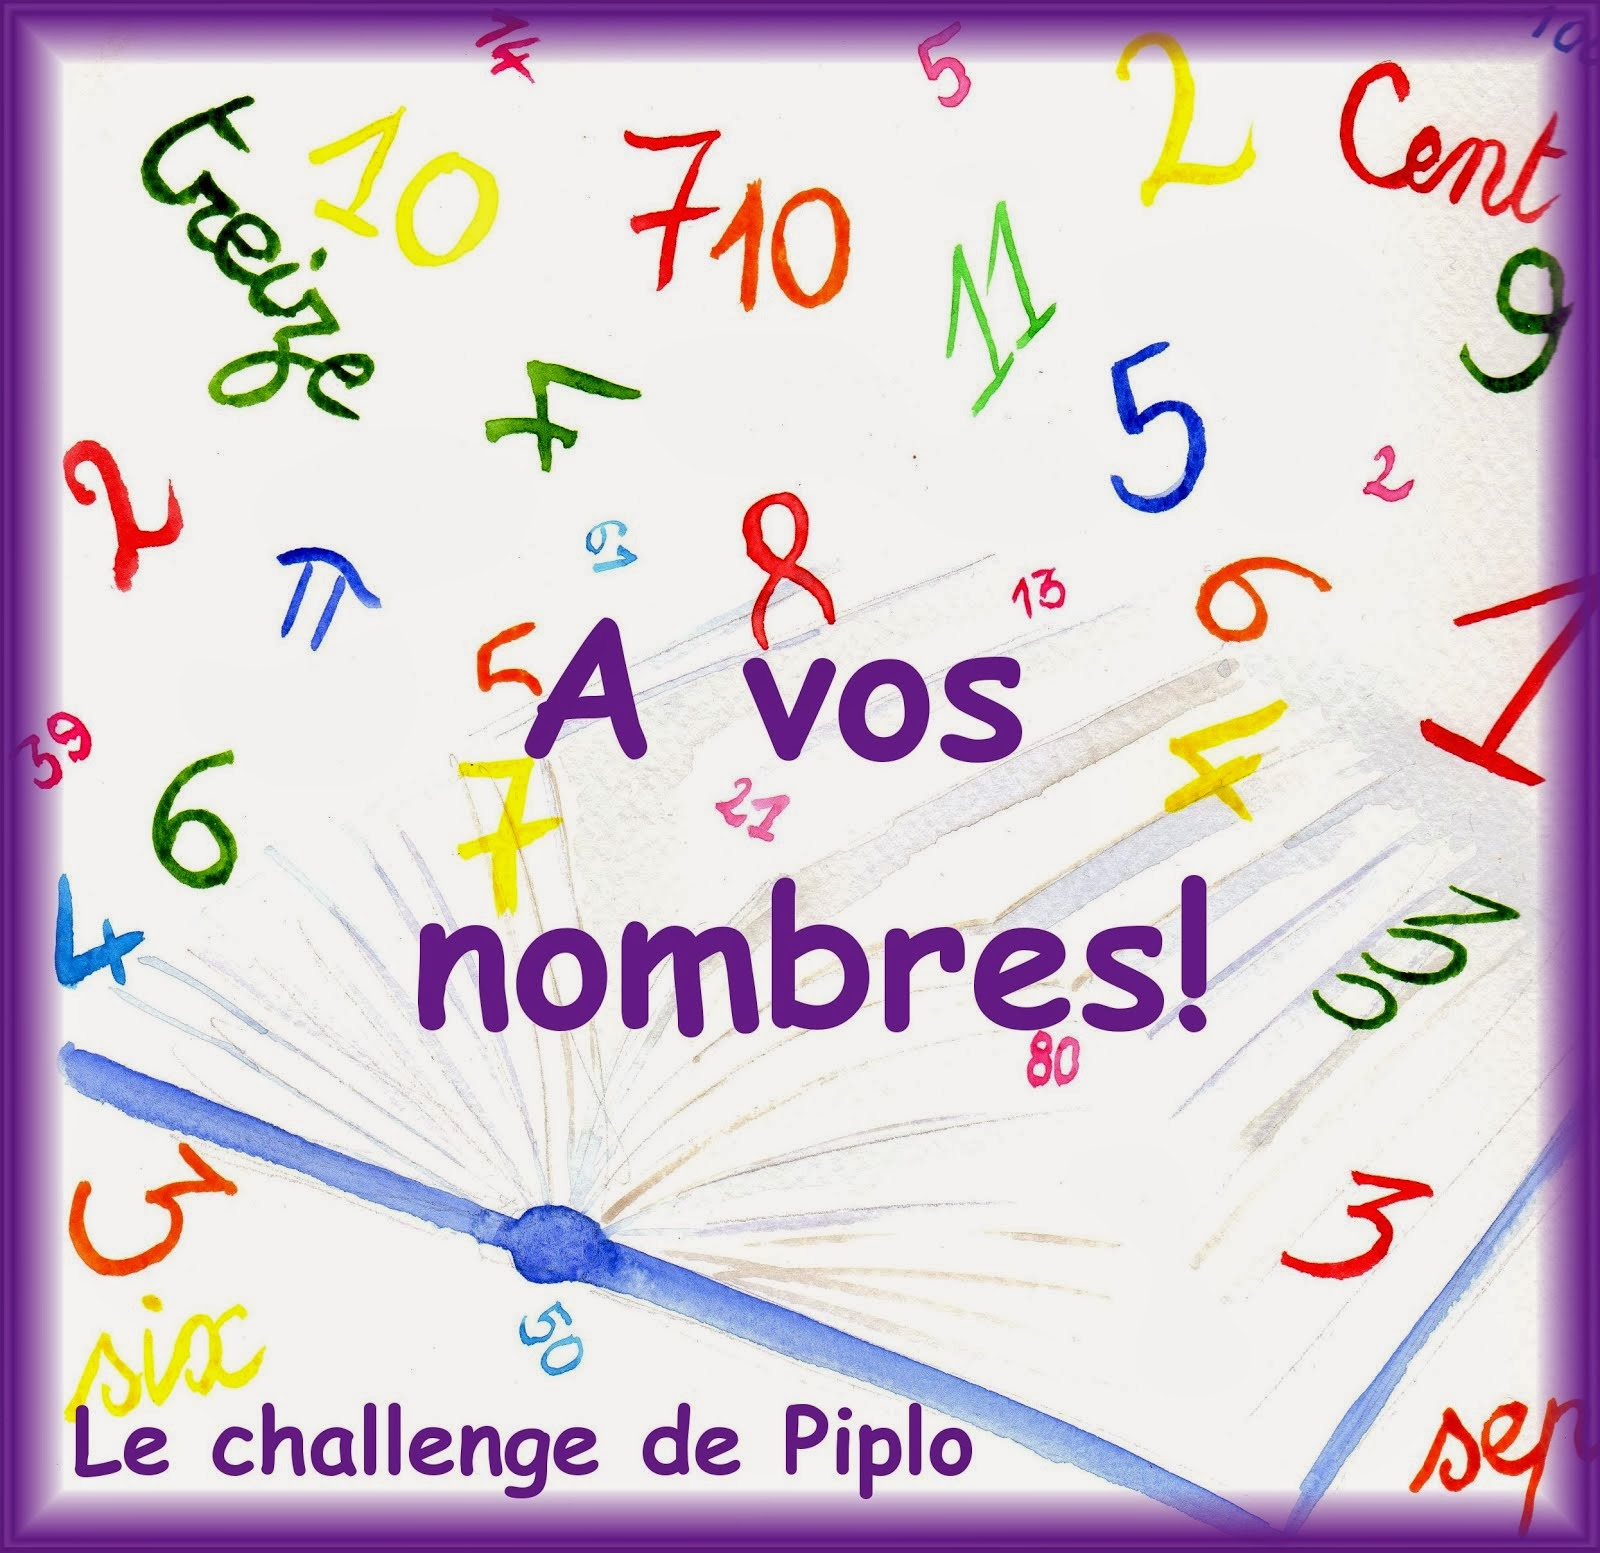 Mon challenge